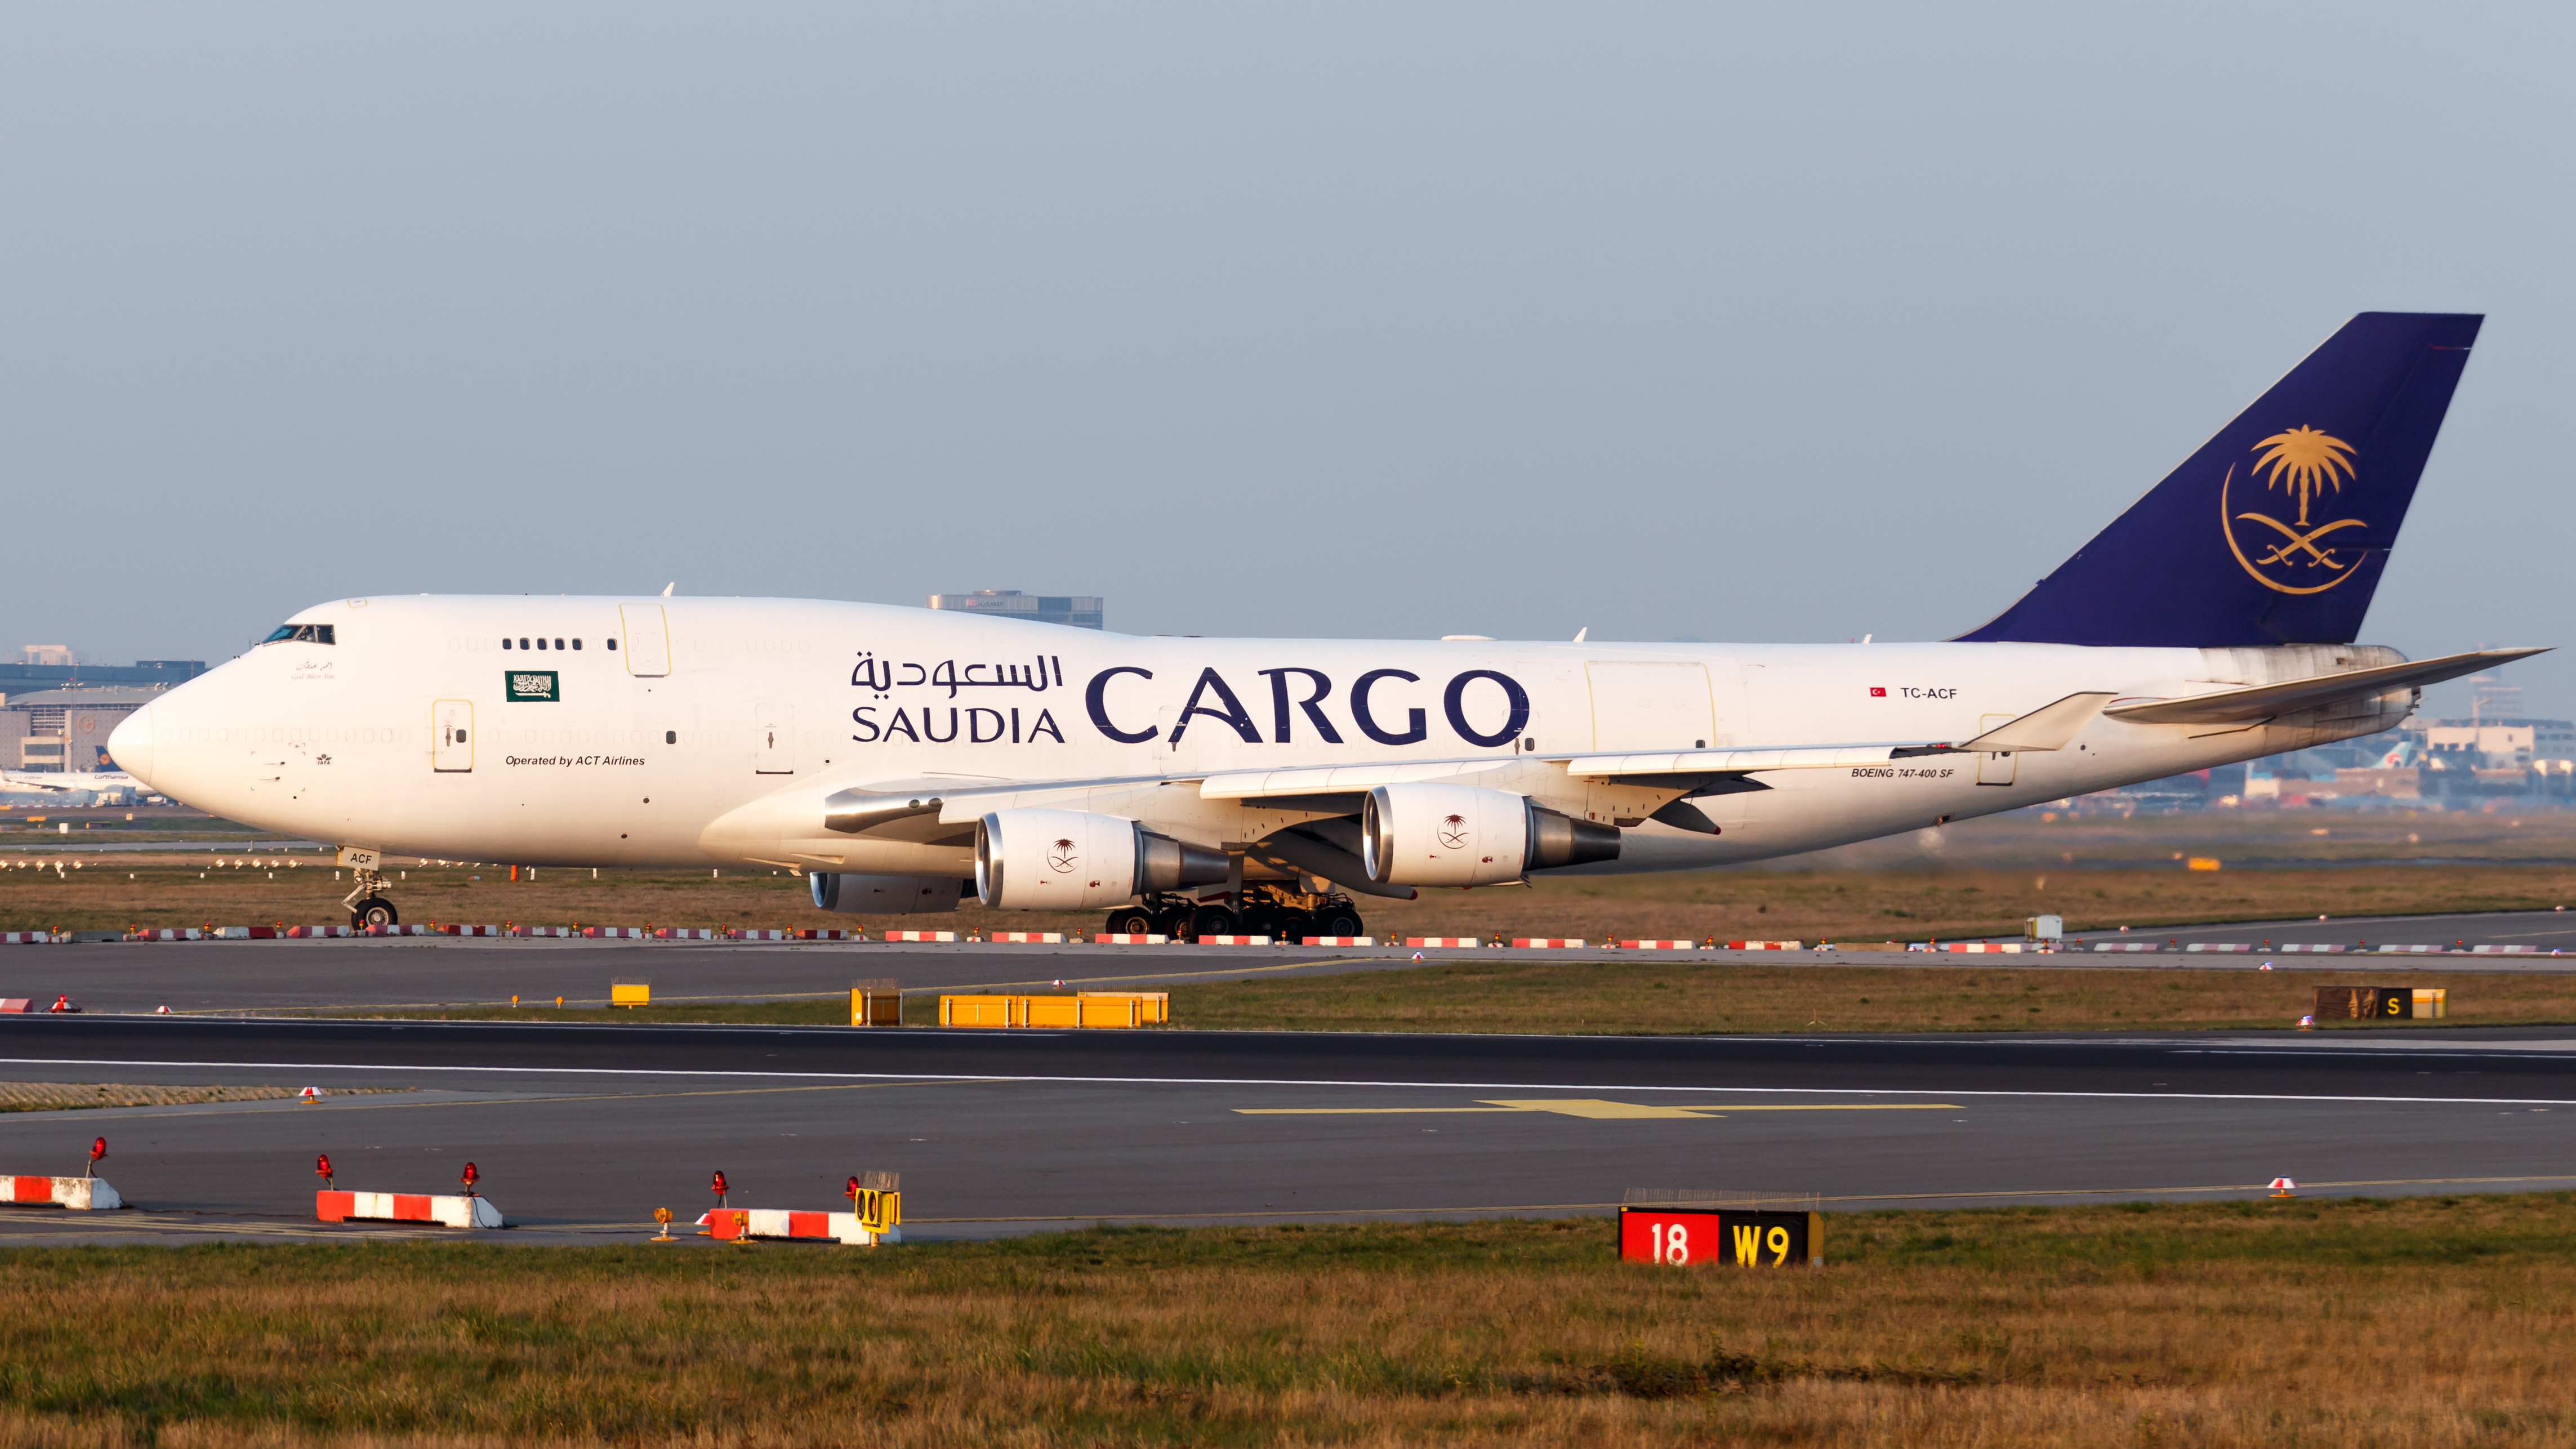 File:Saudia Cargo Boeing 747-400F (TC-ACF) at Frankfurt Airport